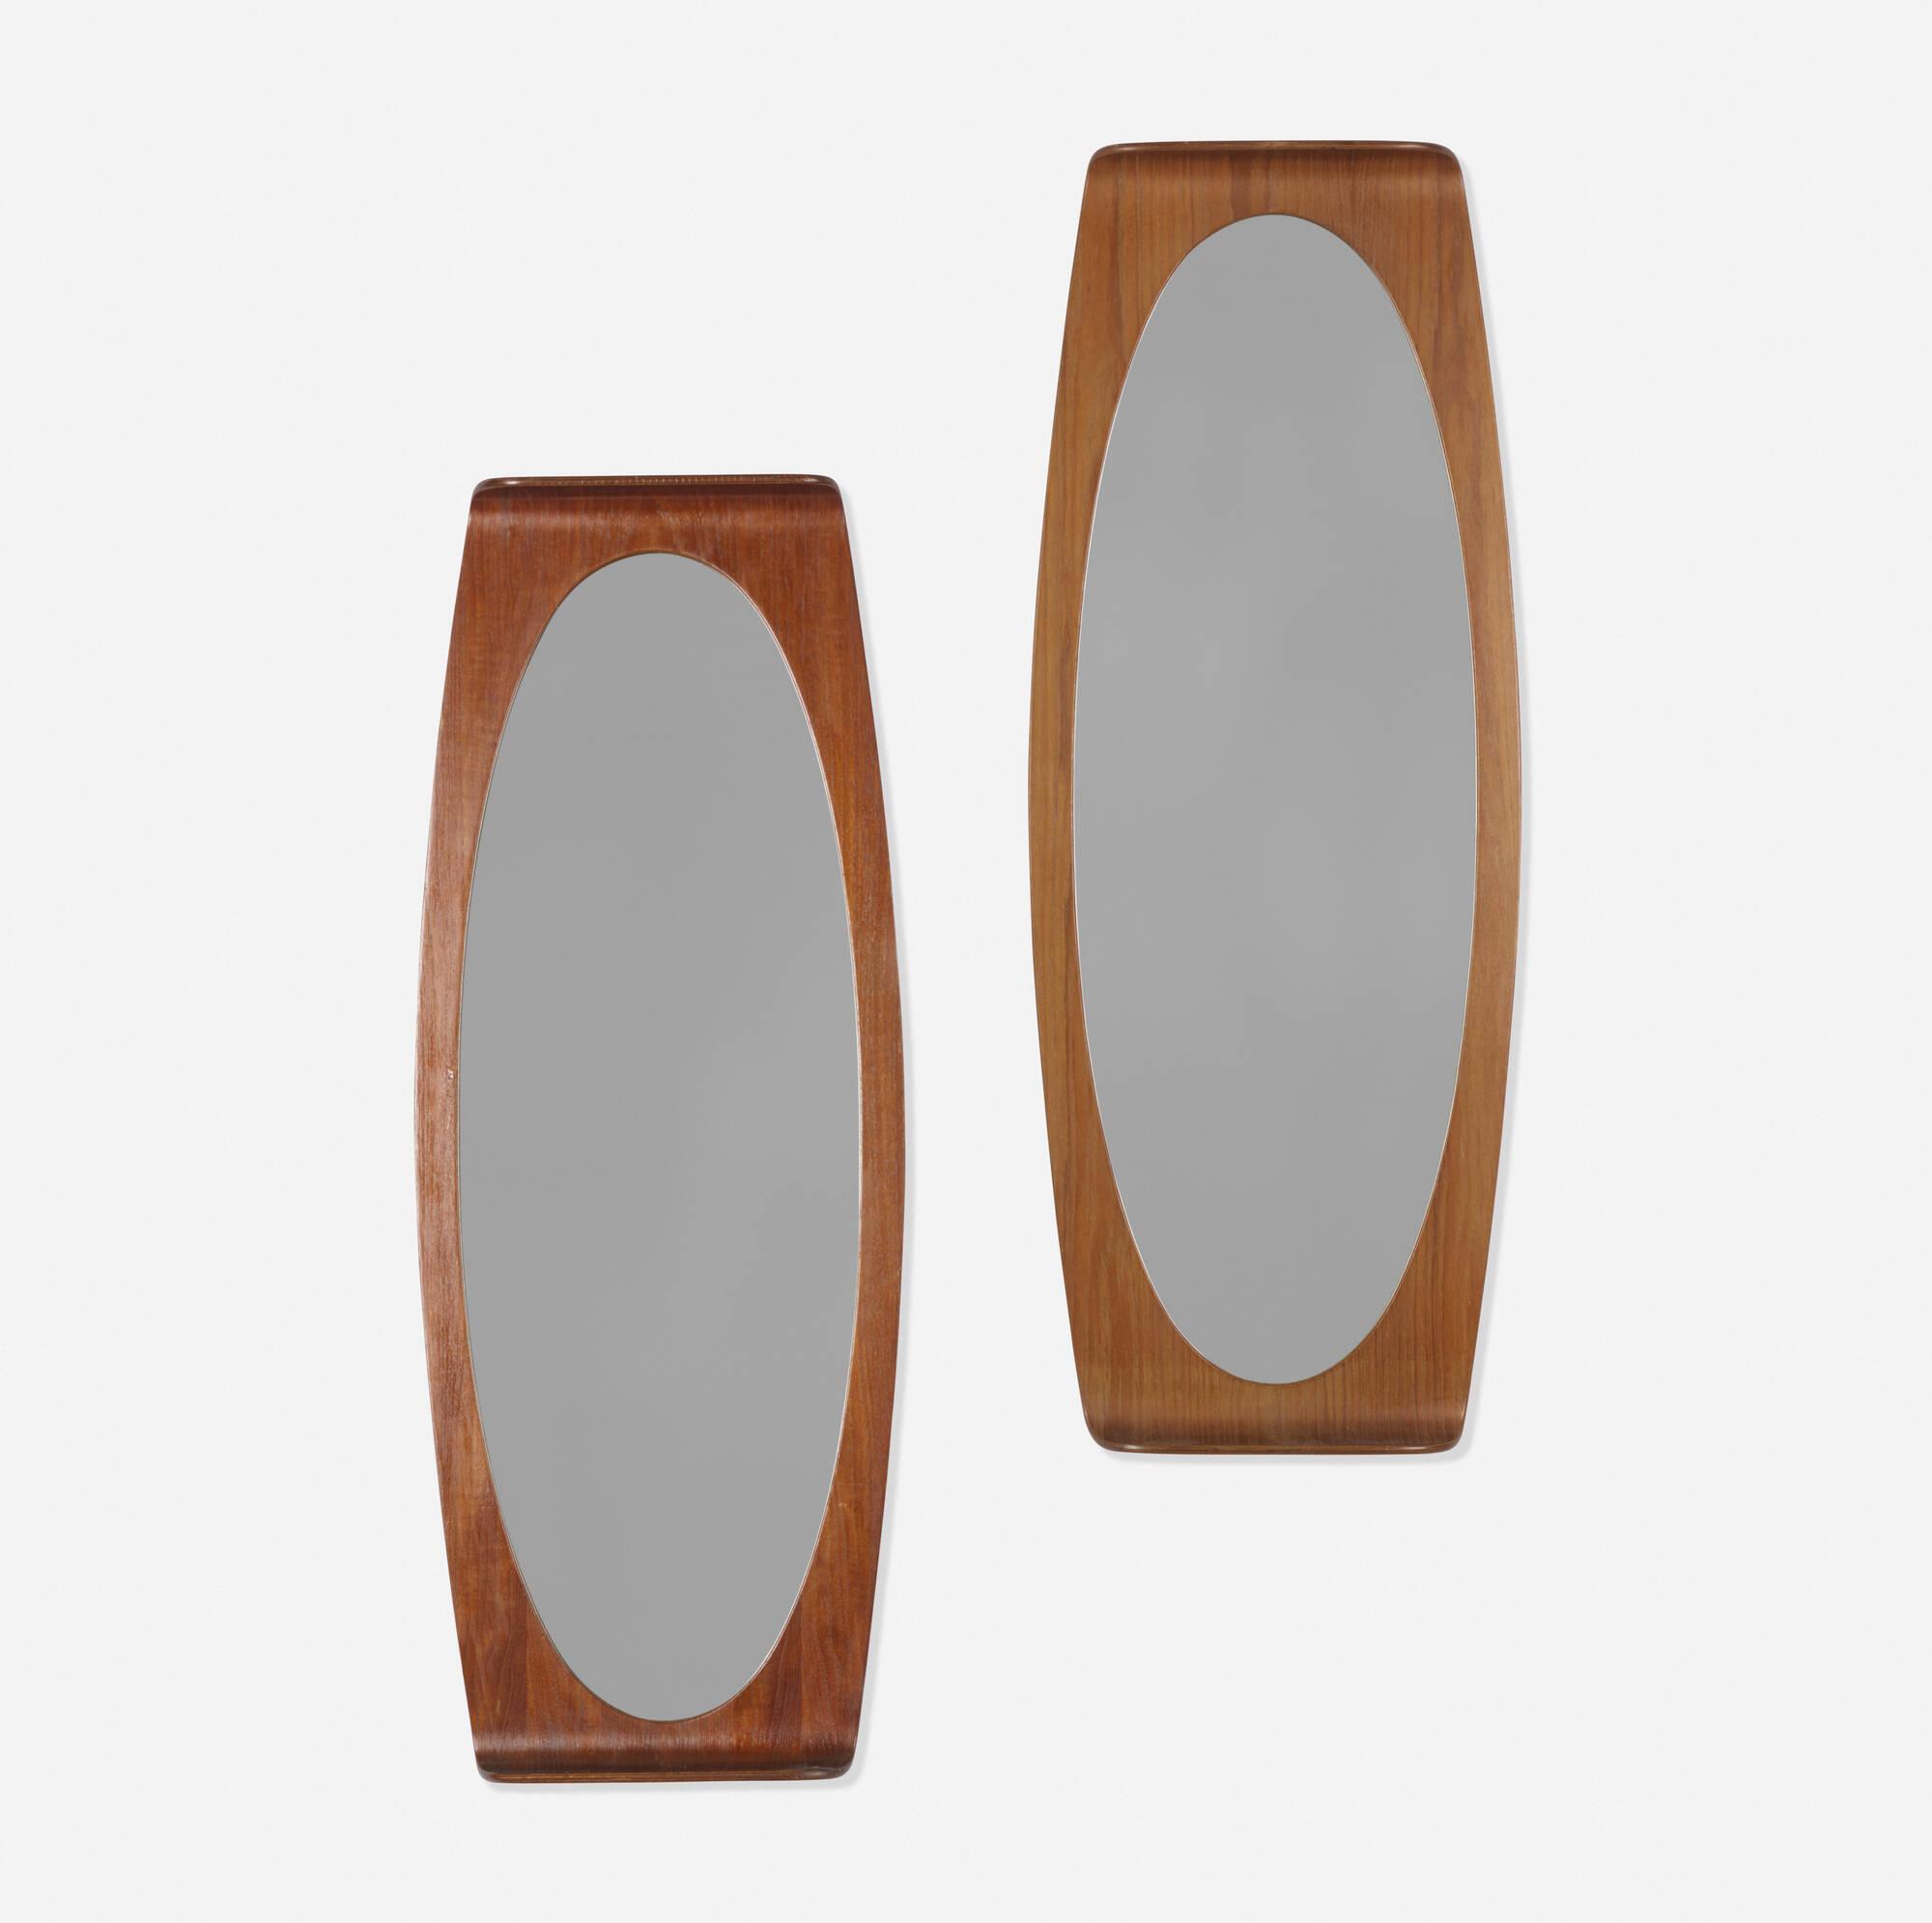 231: Franco Campo and Carlo Graffi / wall mirrors, pair (1 of 2)